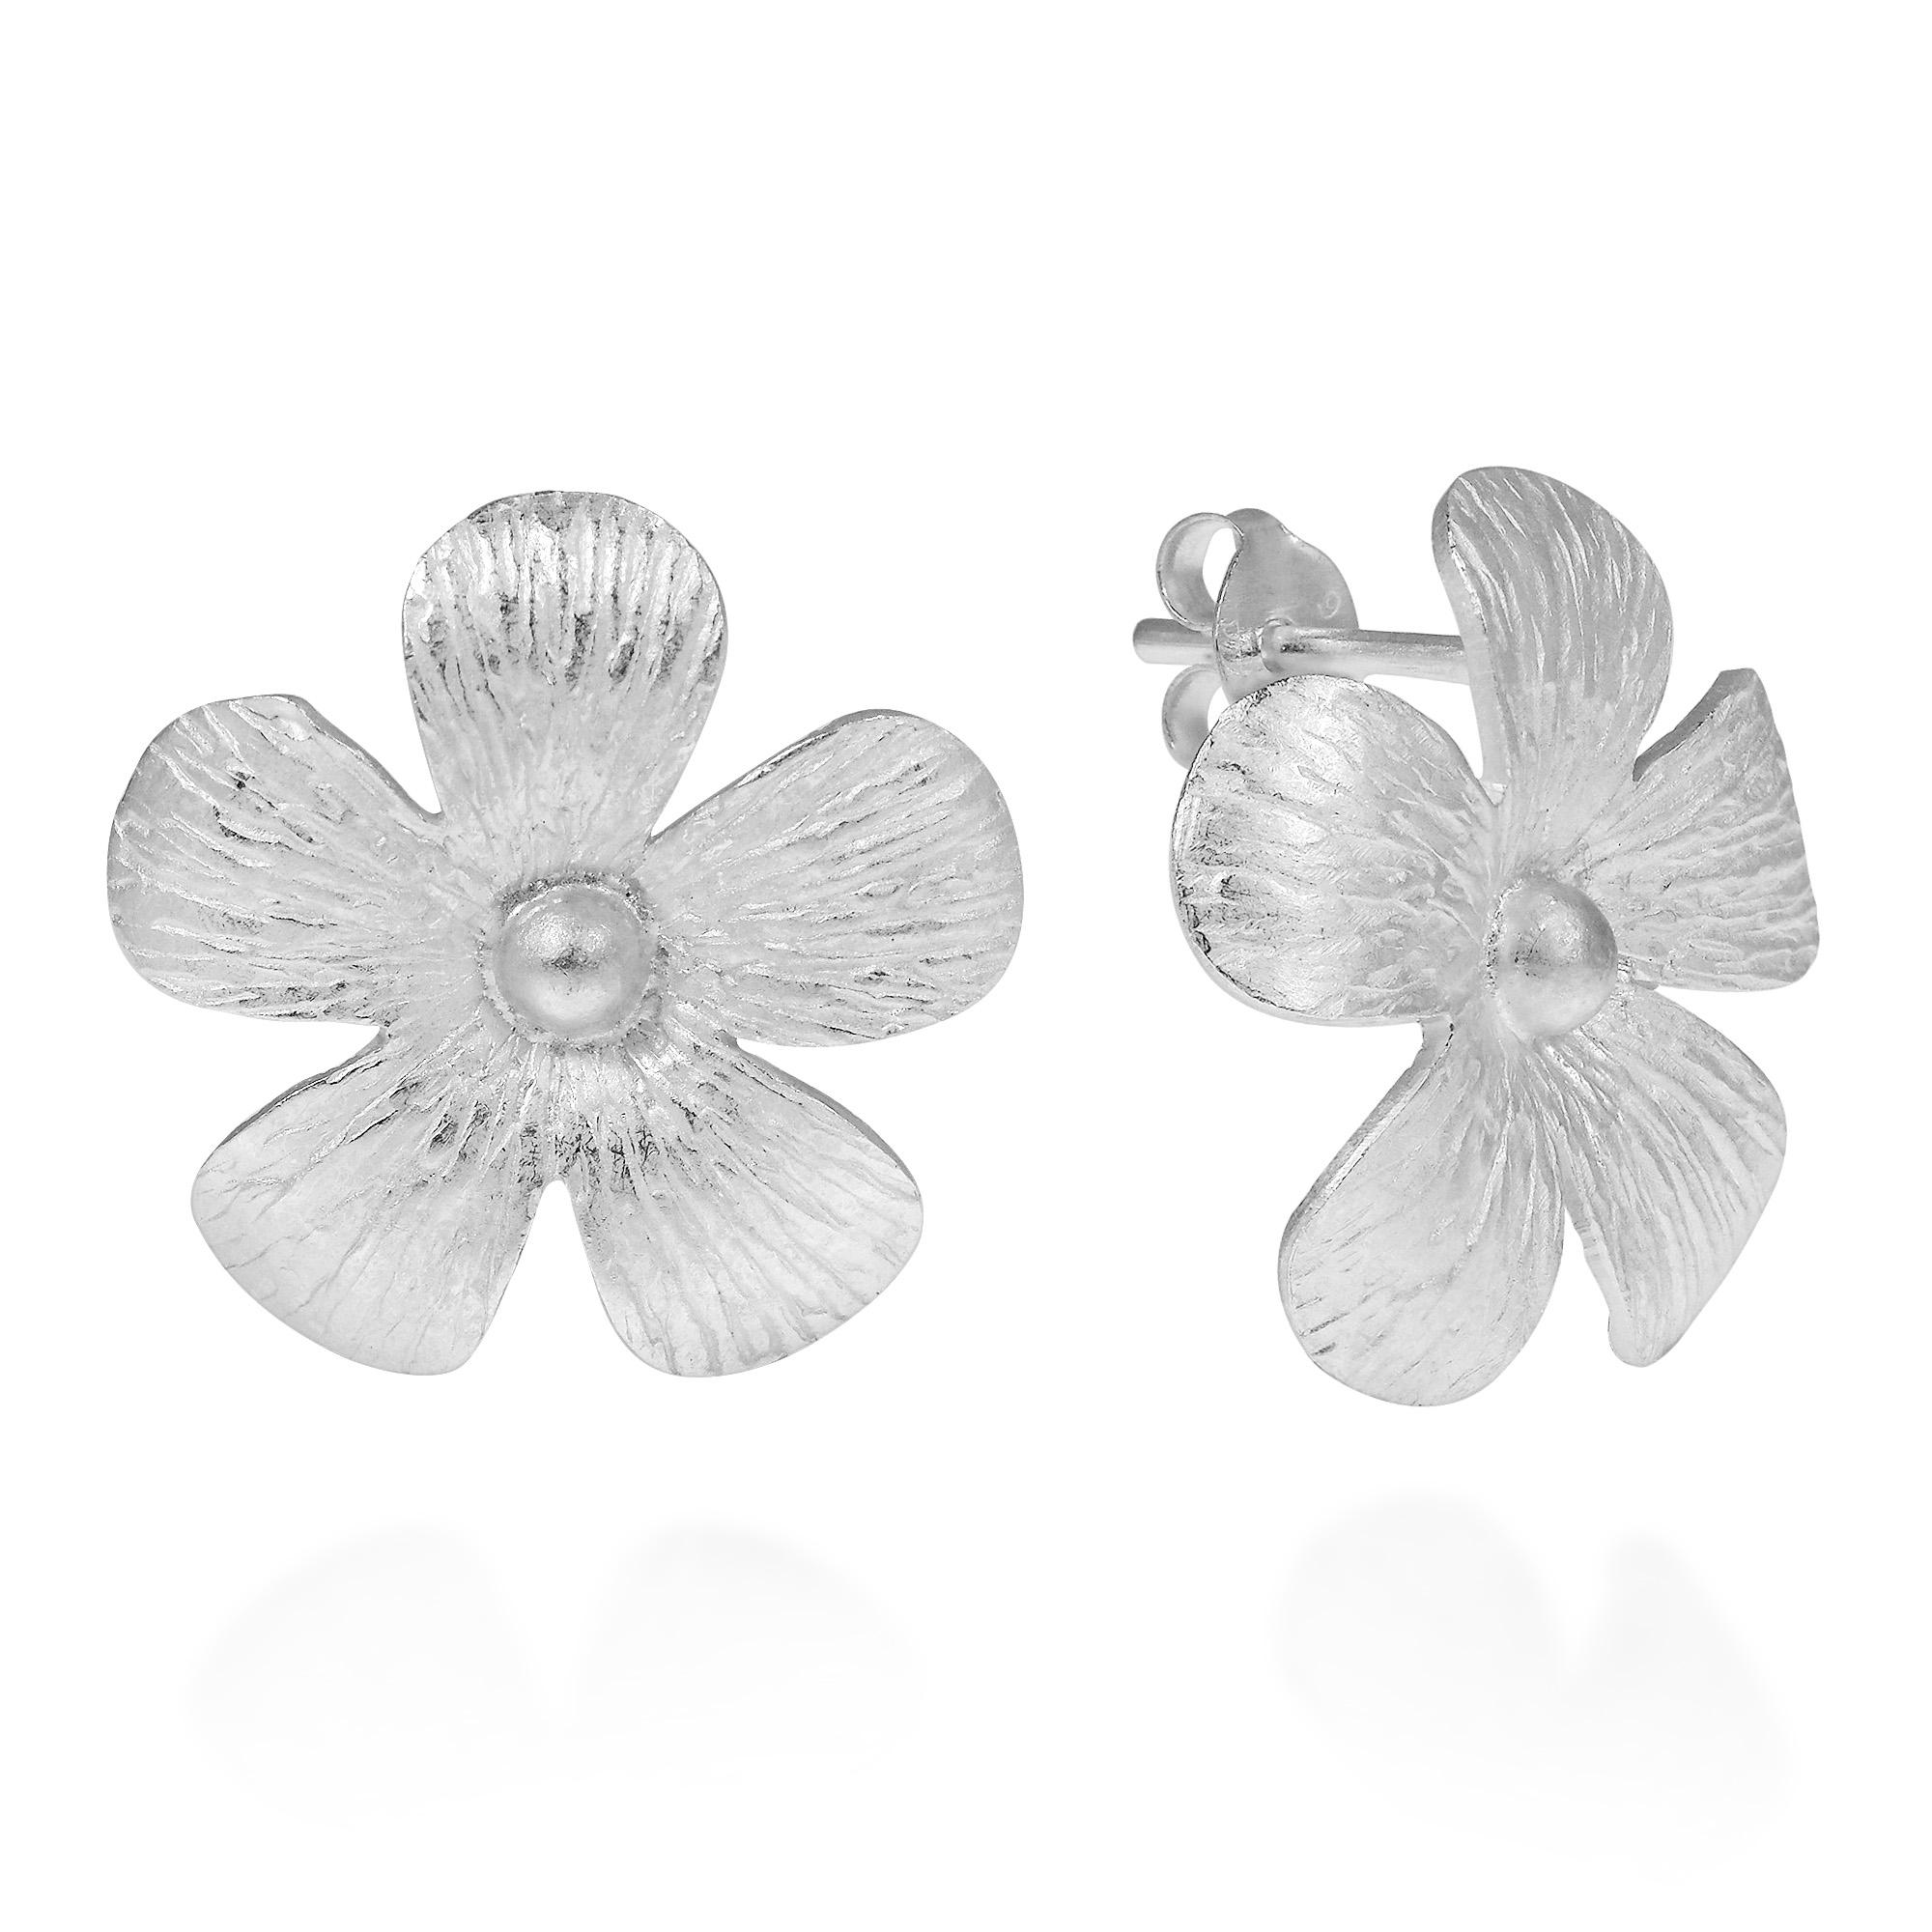 Handmade Hawaiian Plumeria Flower Satin 925 Silver Post Earrings